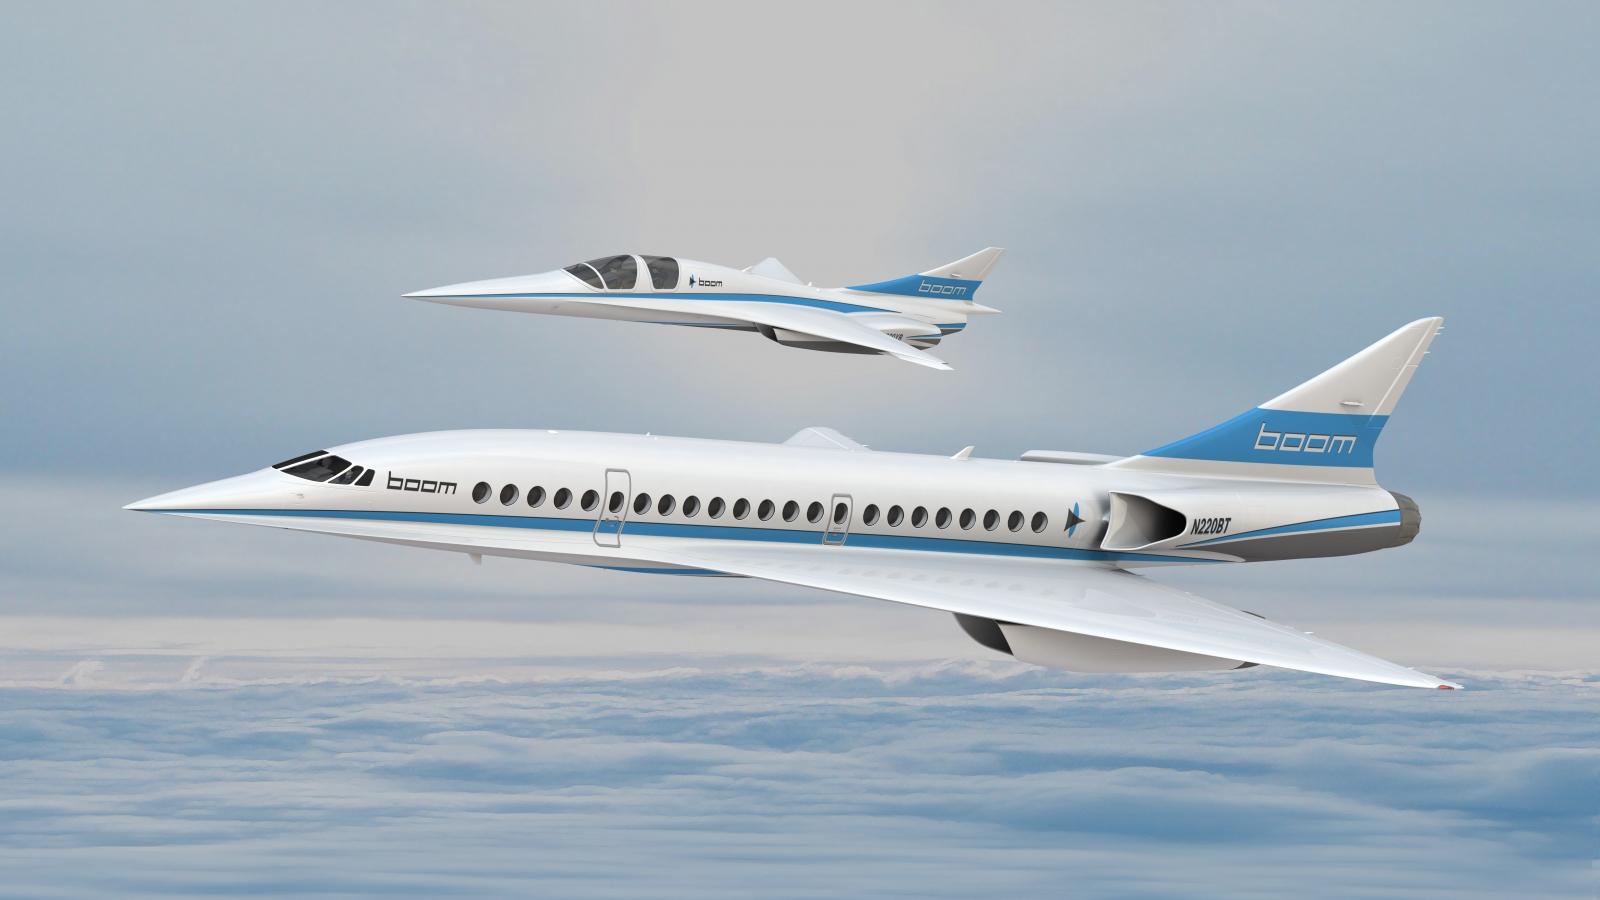 Boom technology supersonic plane render